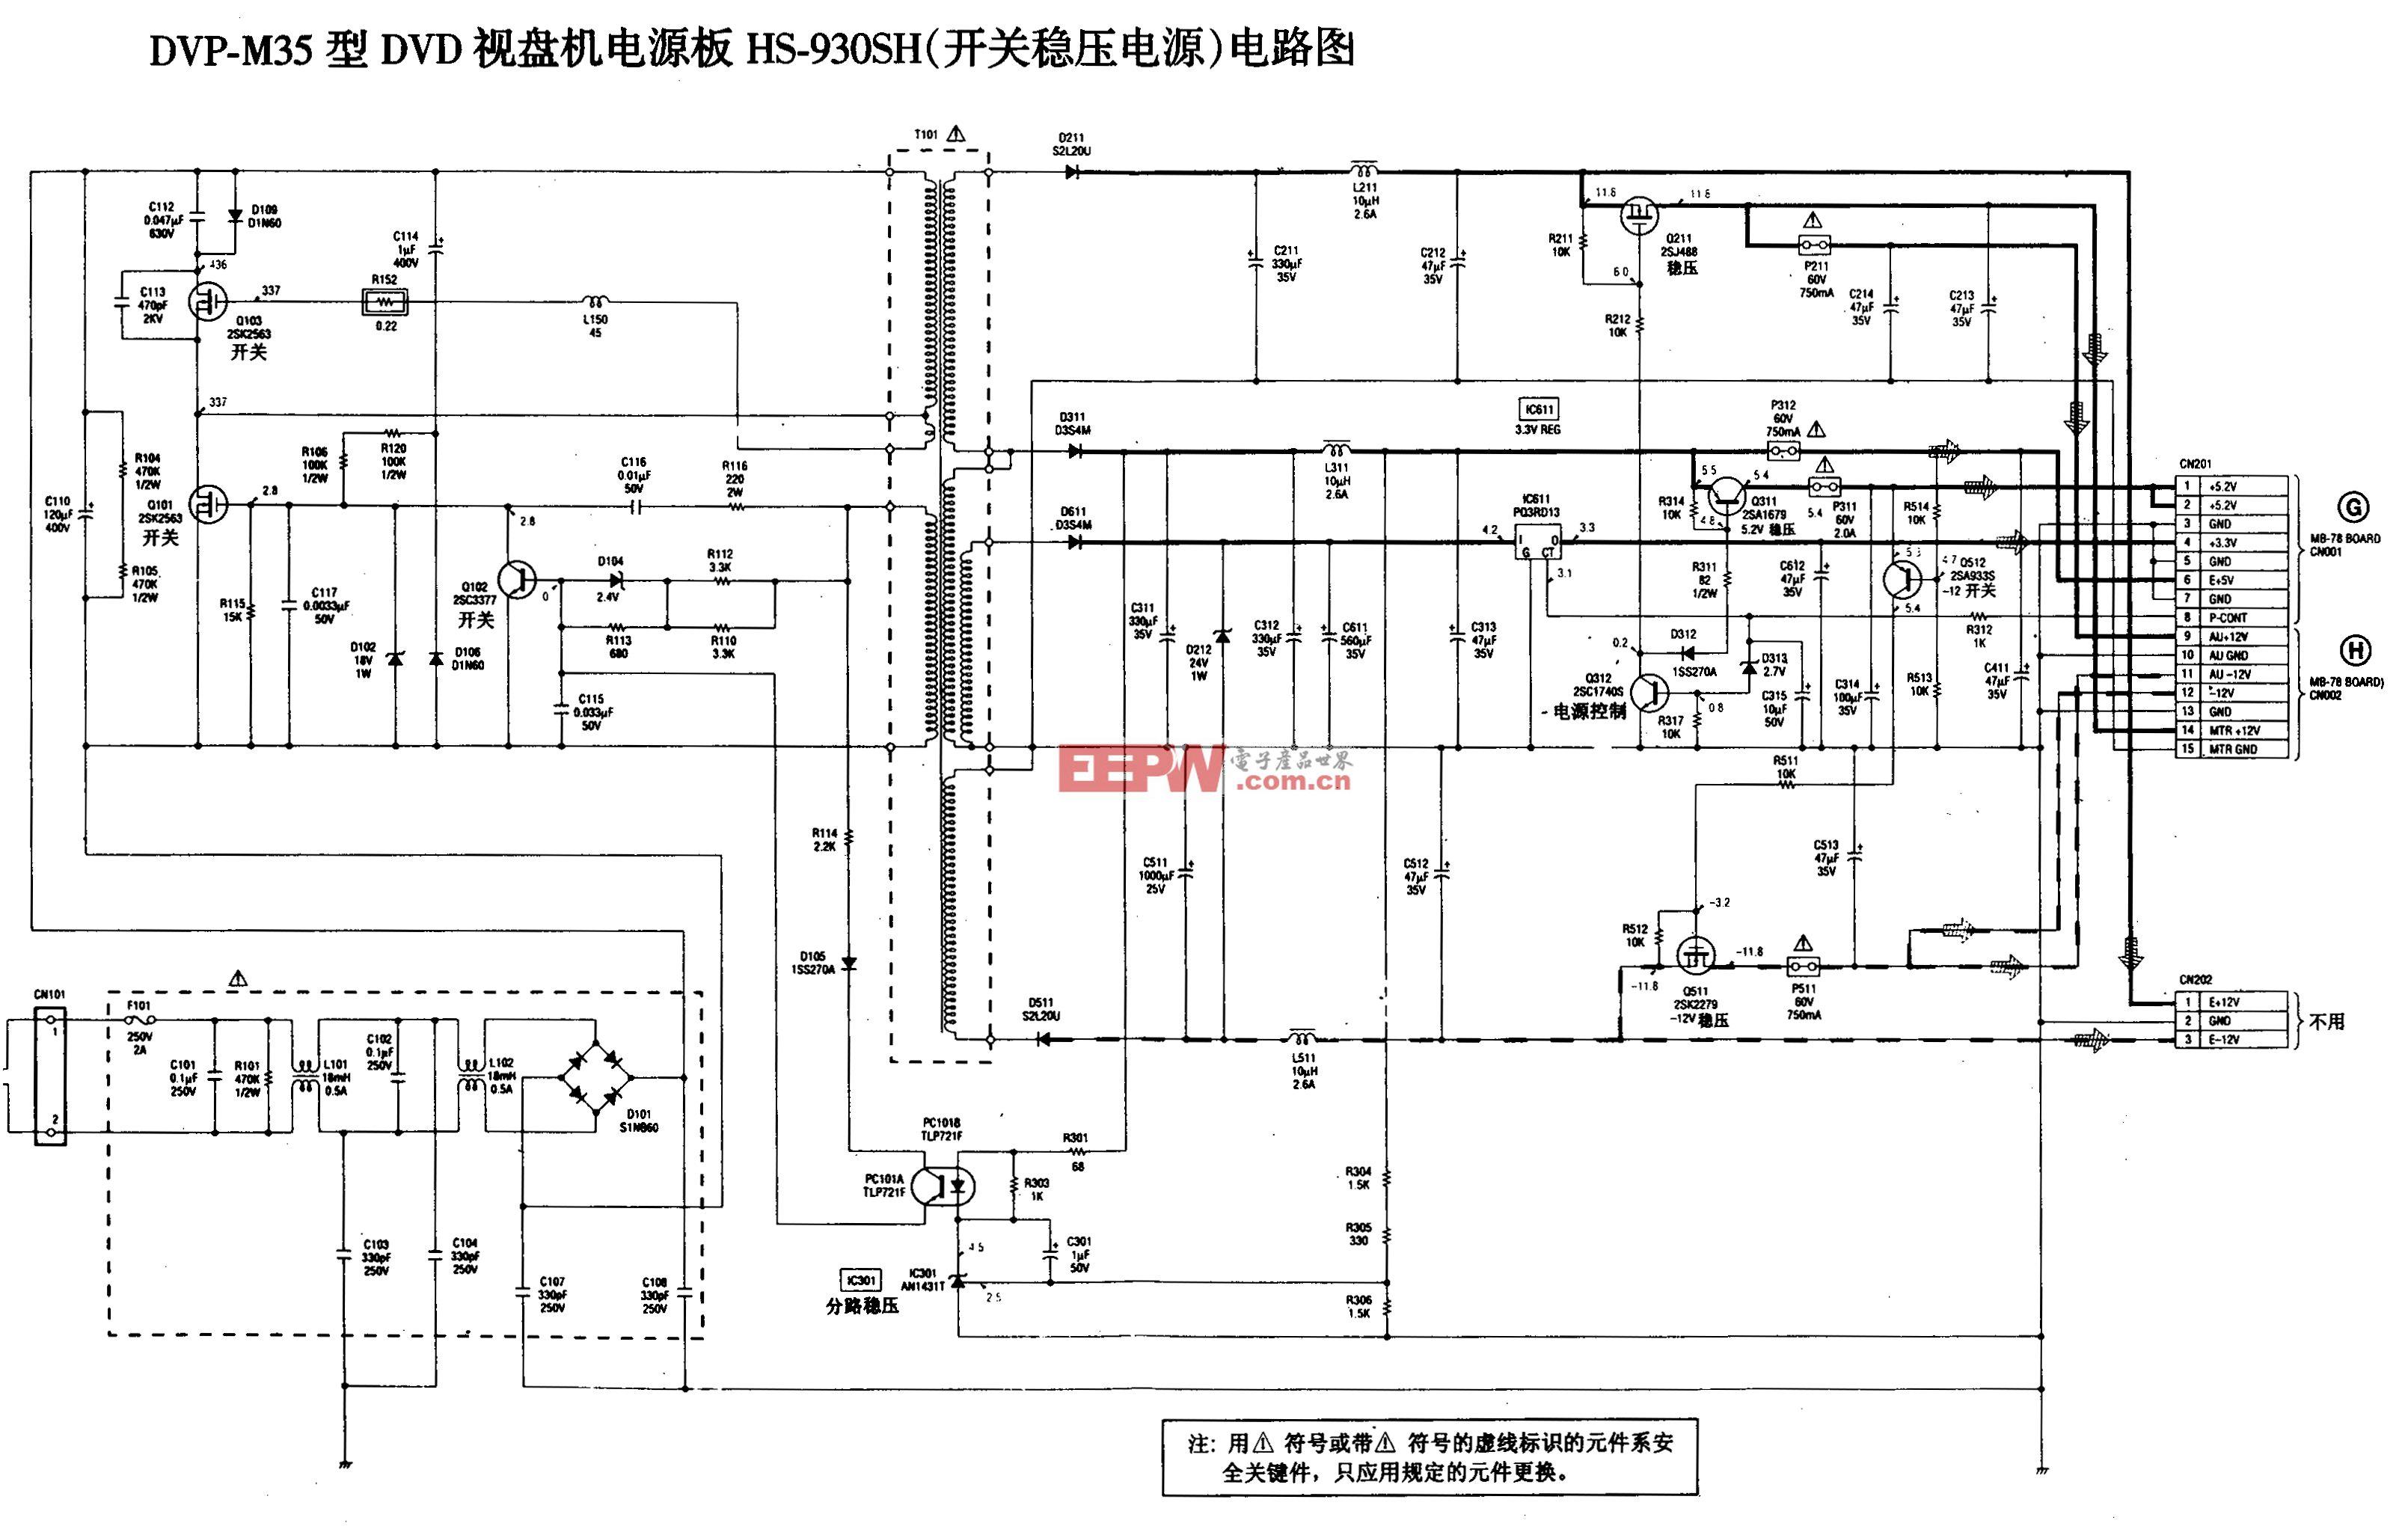 SONY DVP-M35型DVD-HS-930SH(开关稳压电源)电路图